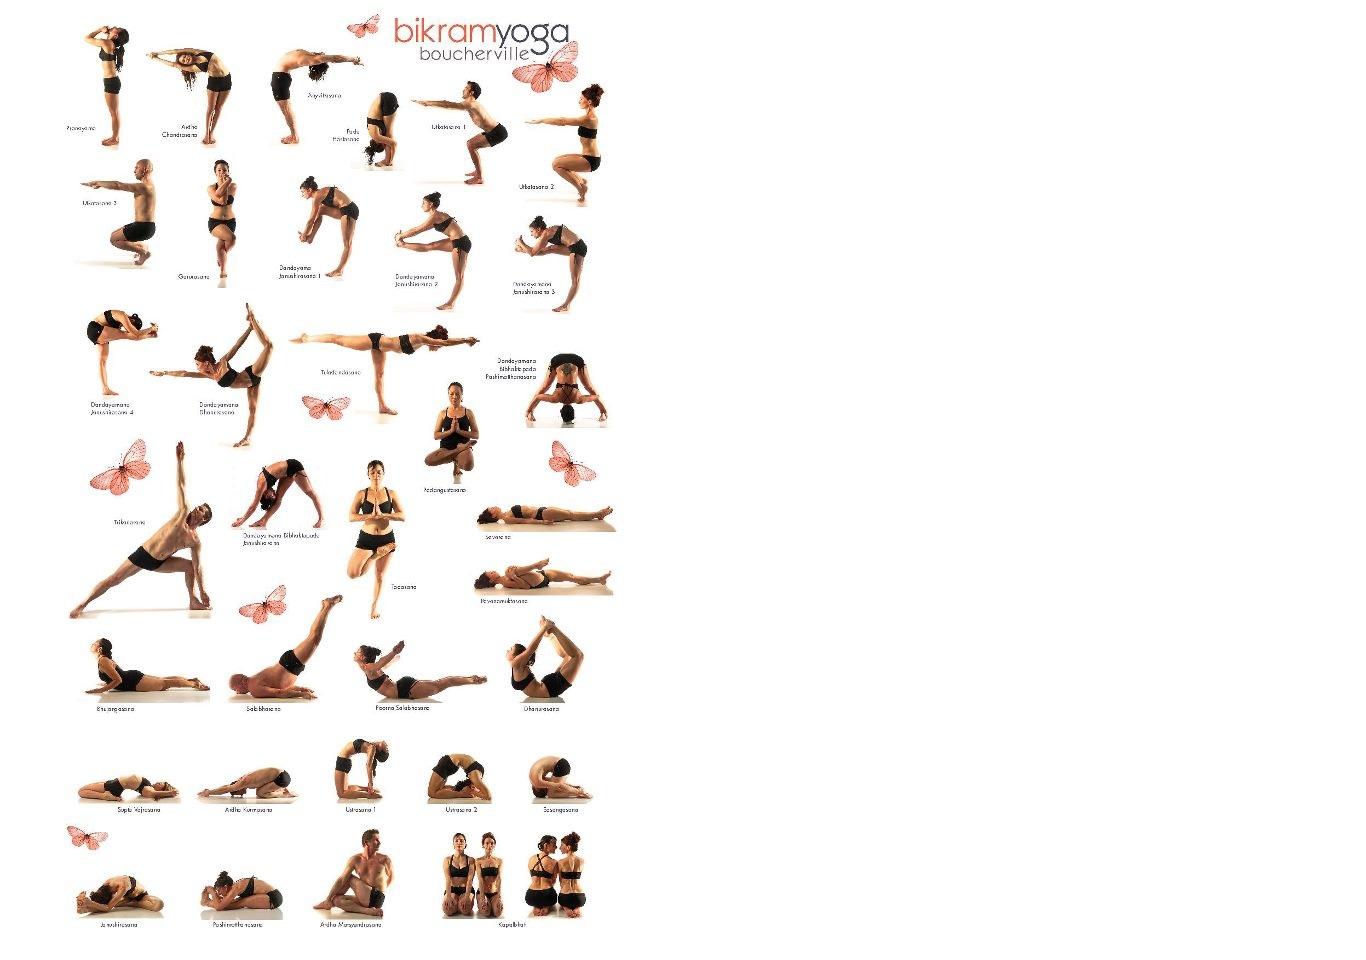 photo relating to Bikram Yoga Poses Chart Printable referred to as Warm Yoga Pose Chart